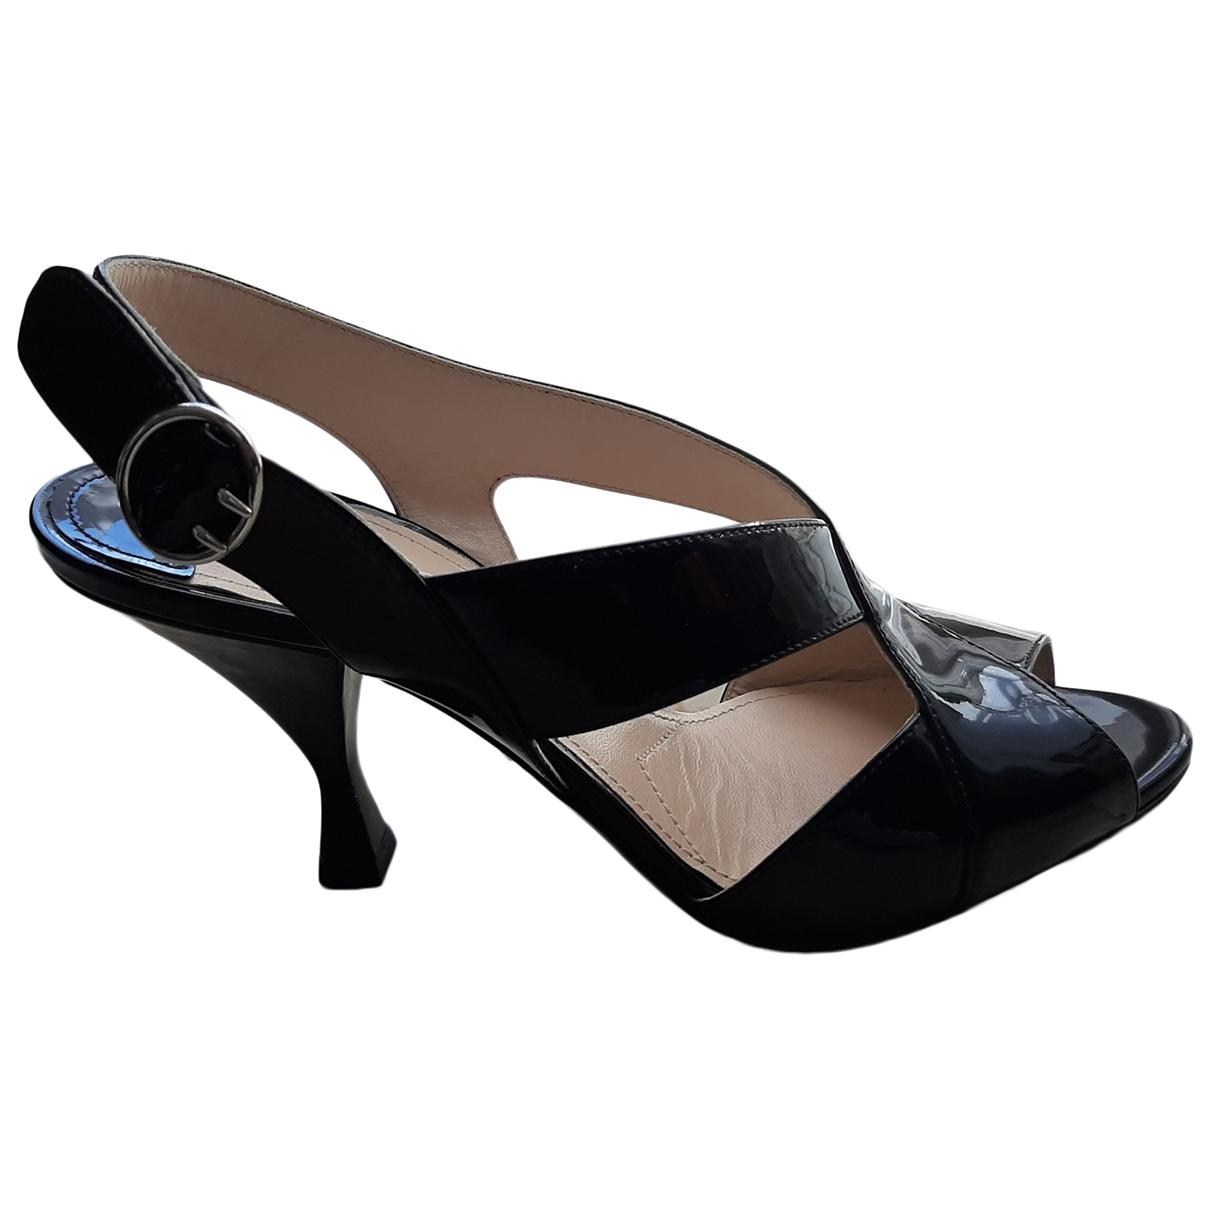 Prada \N Black Patent leather Sandals for Women 37 EU